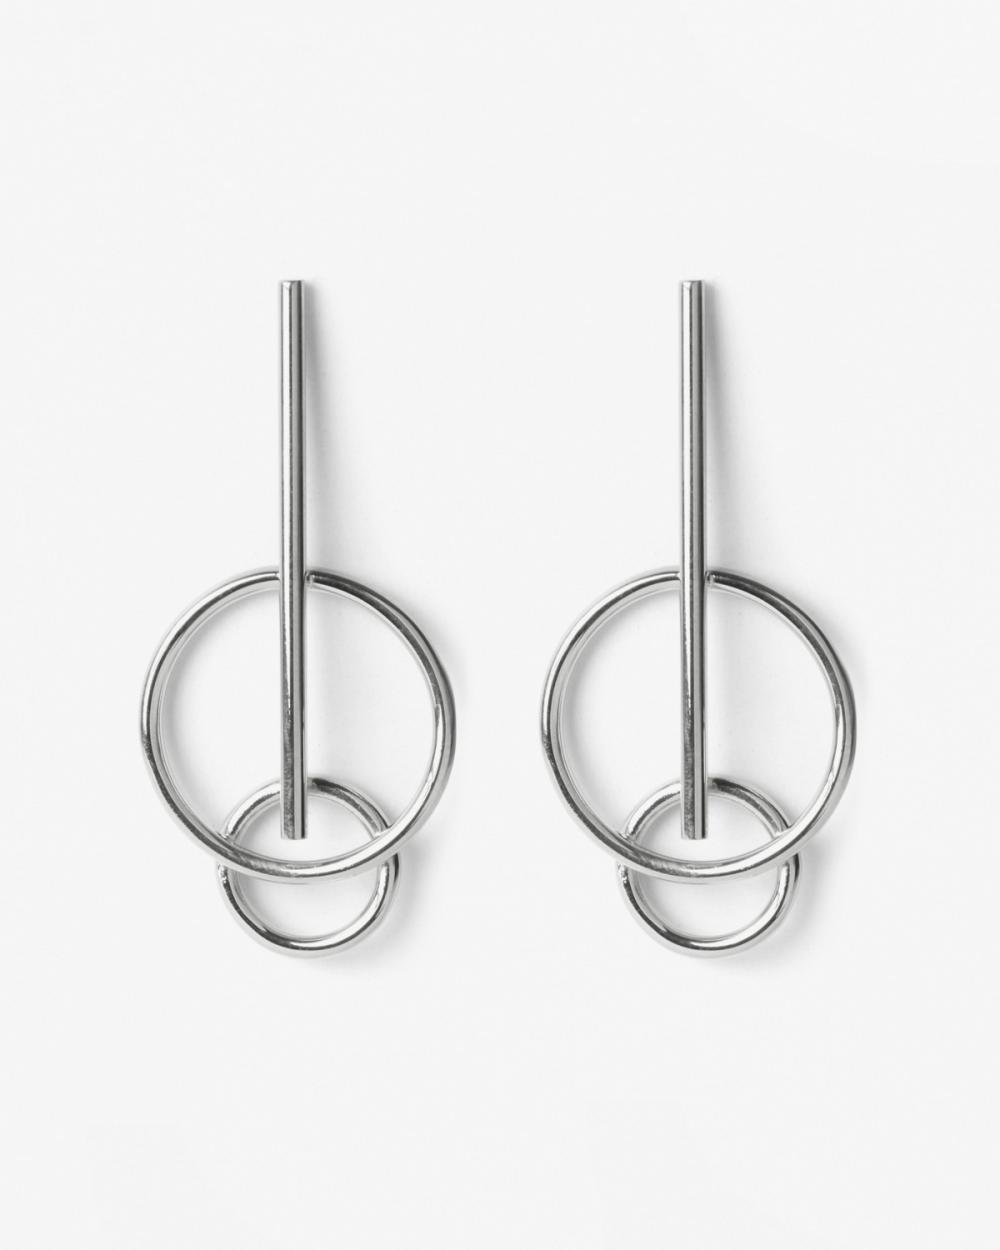 Earrings SILVER JUPITER EARRINGS NOVE25